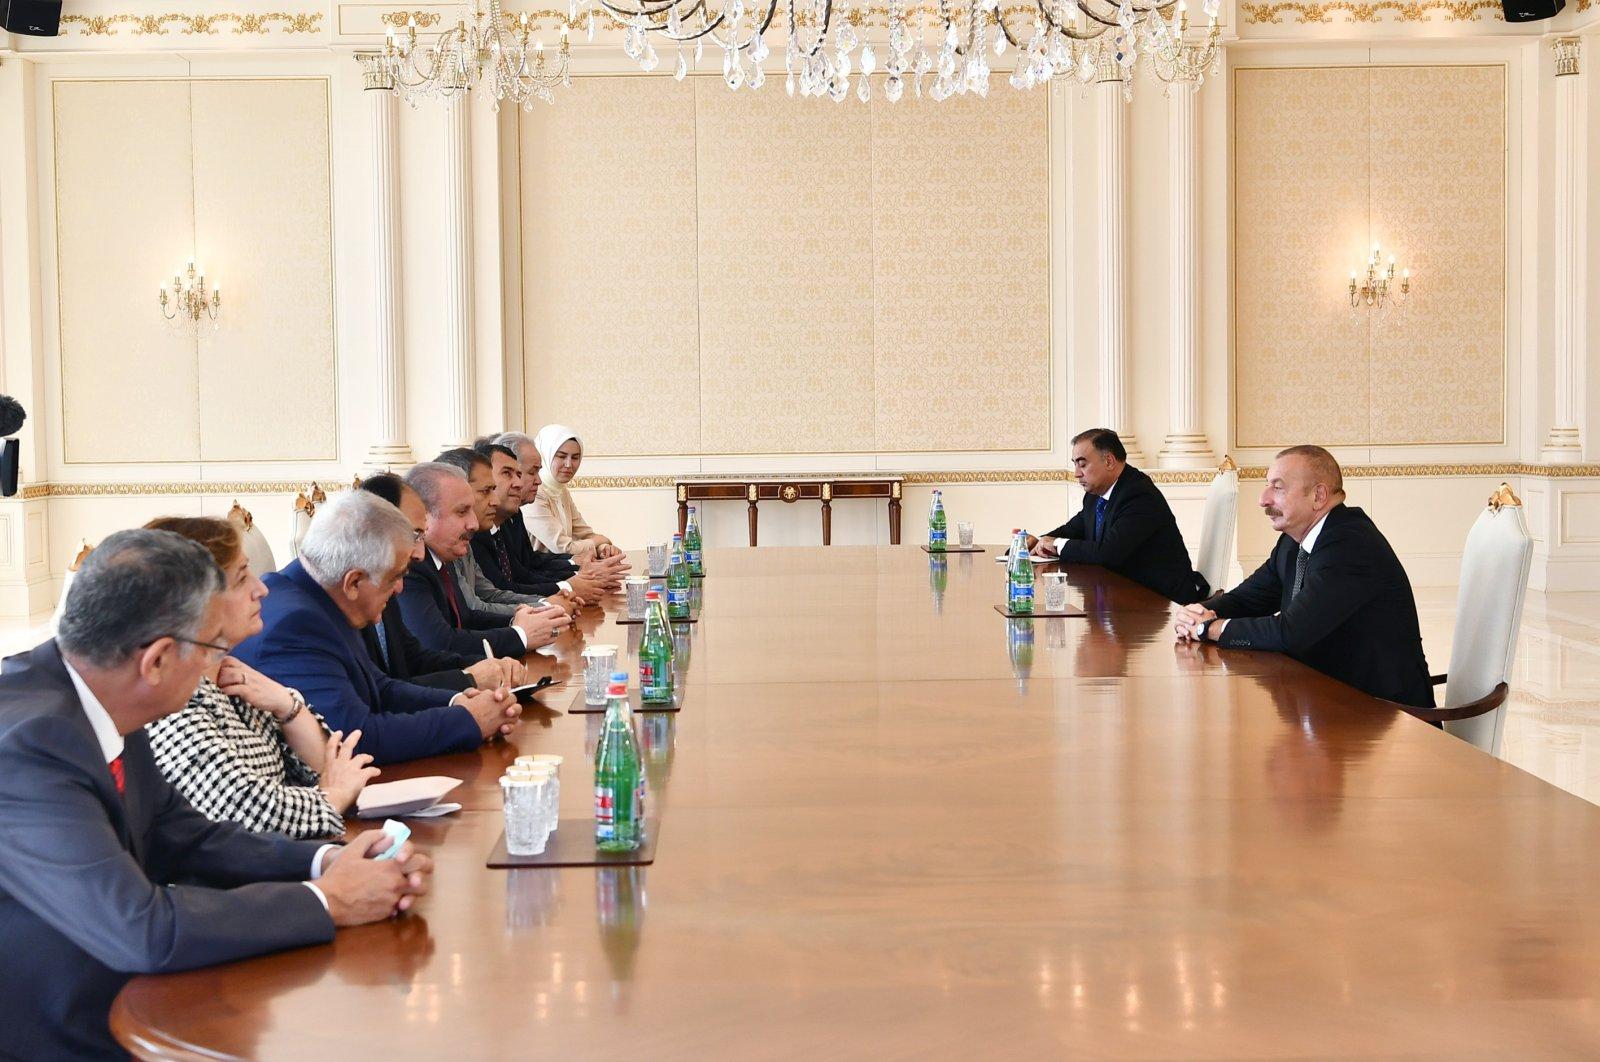 Azerbaijan's President Ilham Aliyev (R) receives Turkey's Parliament Speaker Mustafa Şentop (L-C) in the Zagulba Palace, Baku, Azerbaijan, July 27, 2021. (AA Photo)